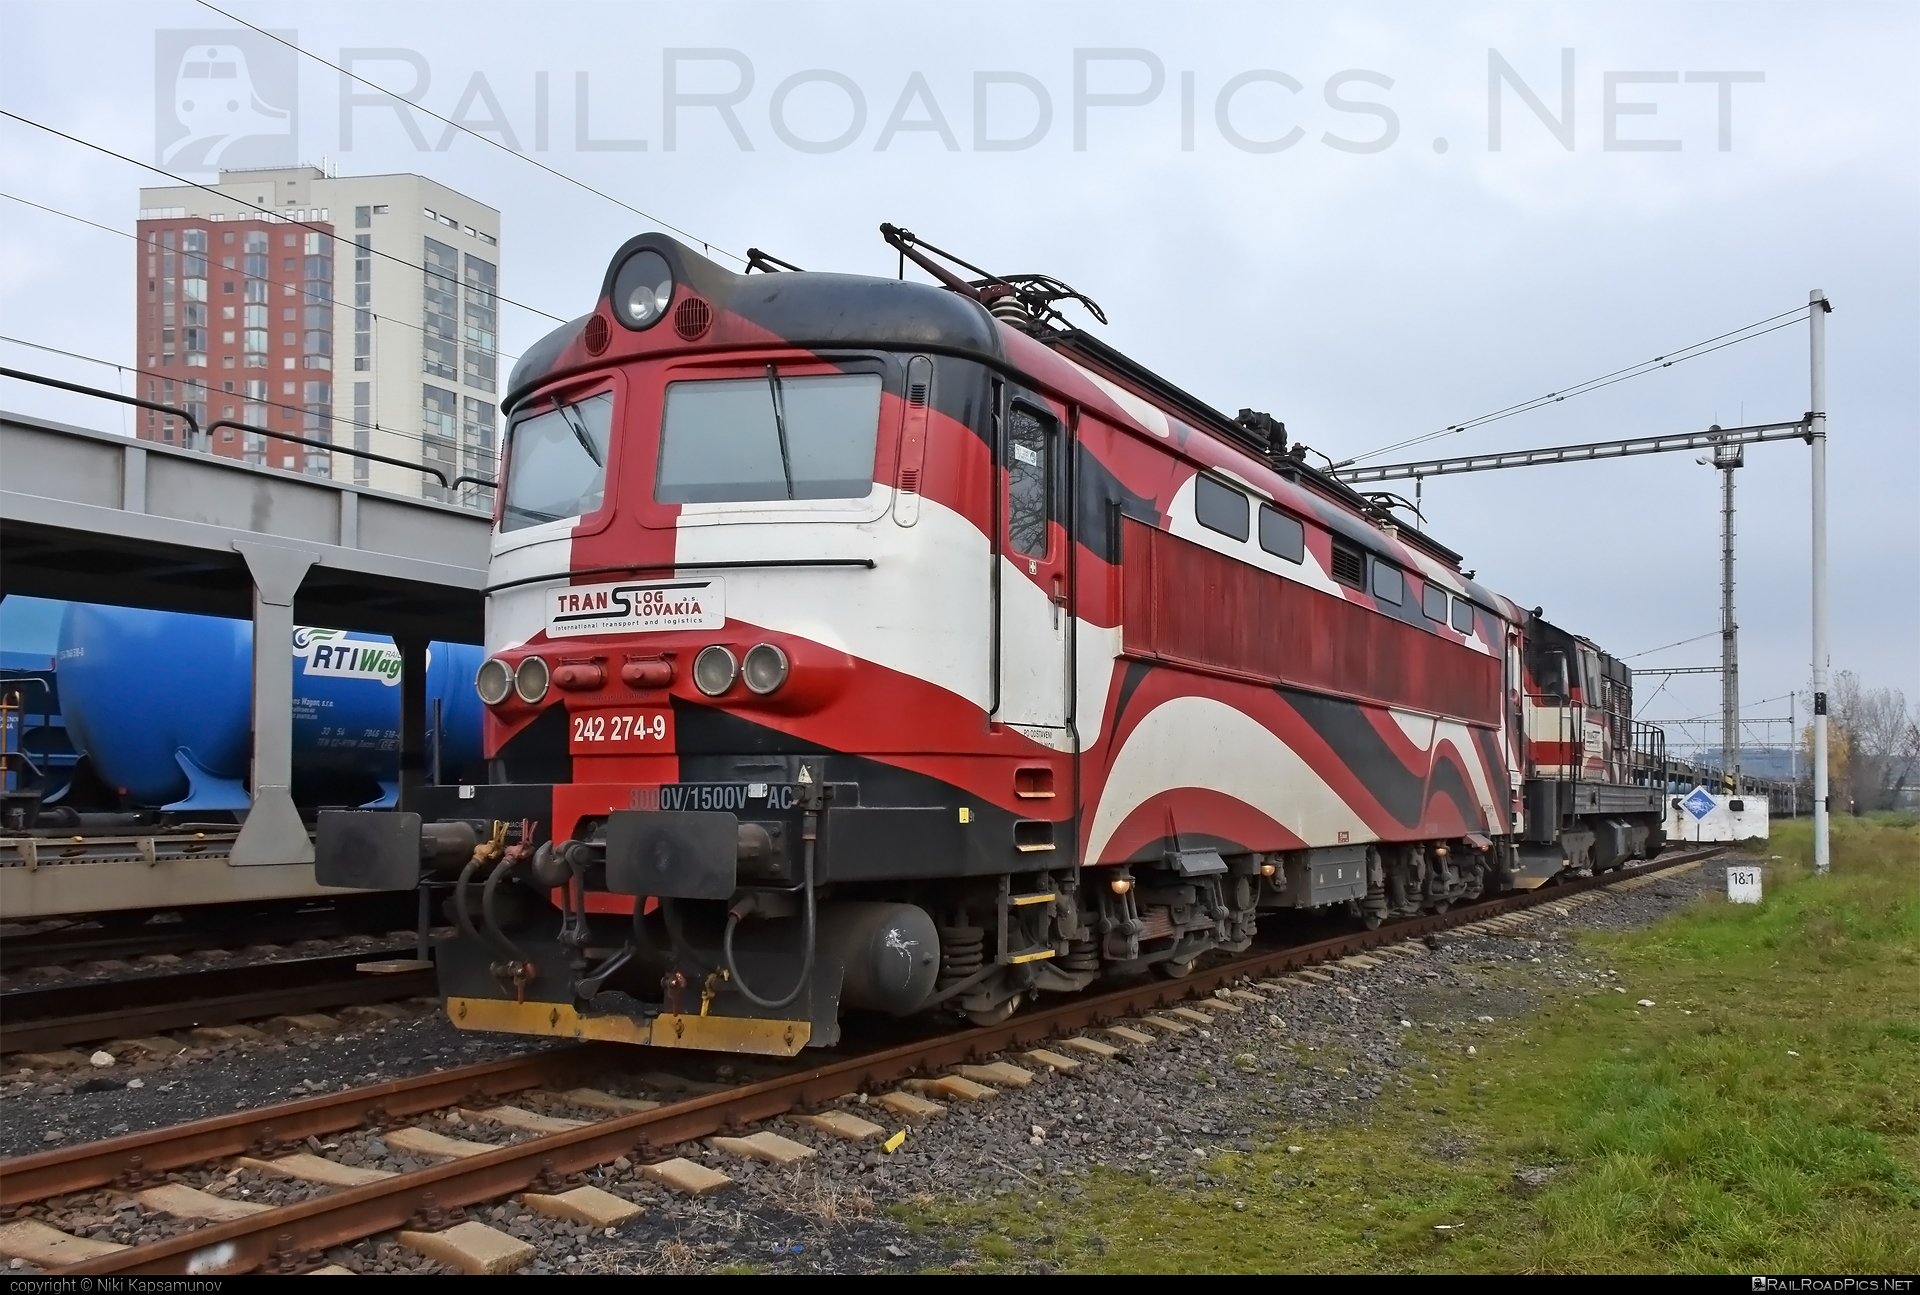 Škoda 73E - 242 274-9 operated by PETROLSPED Slovakia s.r.o. #locomotive242 #plechac #skoda #skoda73e #tlssk #translog #translogslovakia